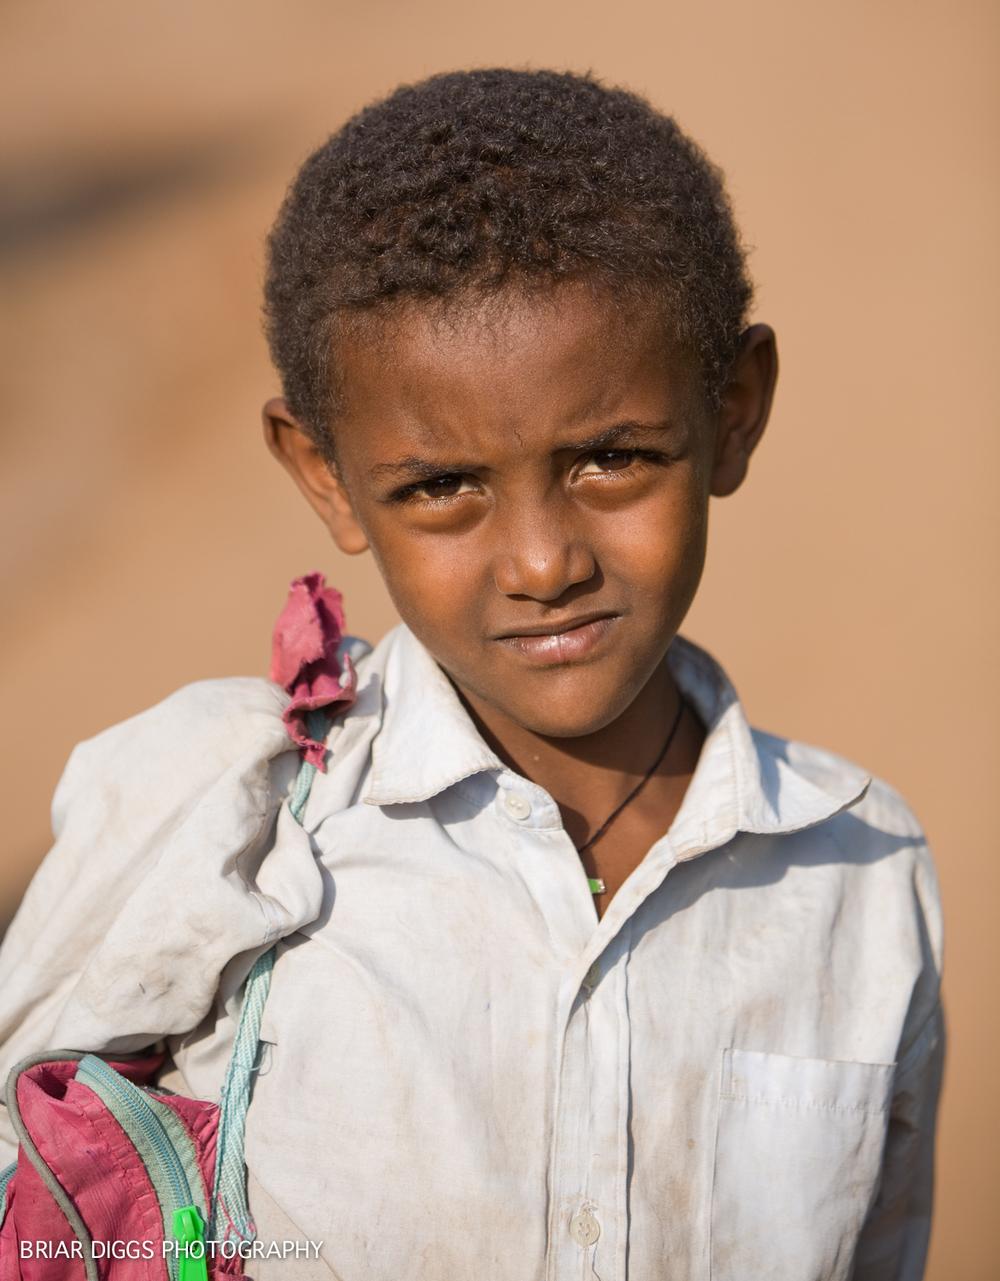 ETHIOPIAN PORTRAITS-65.jpg